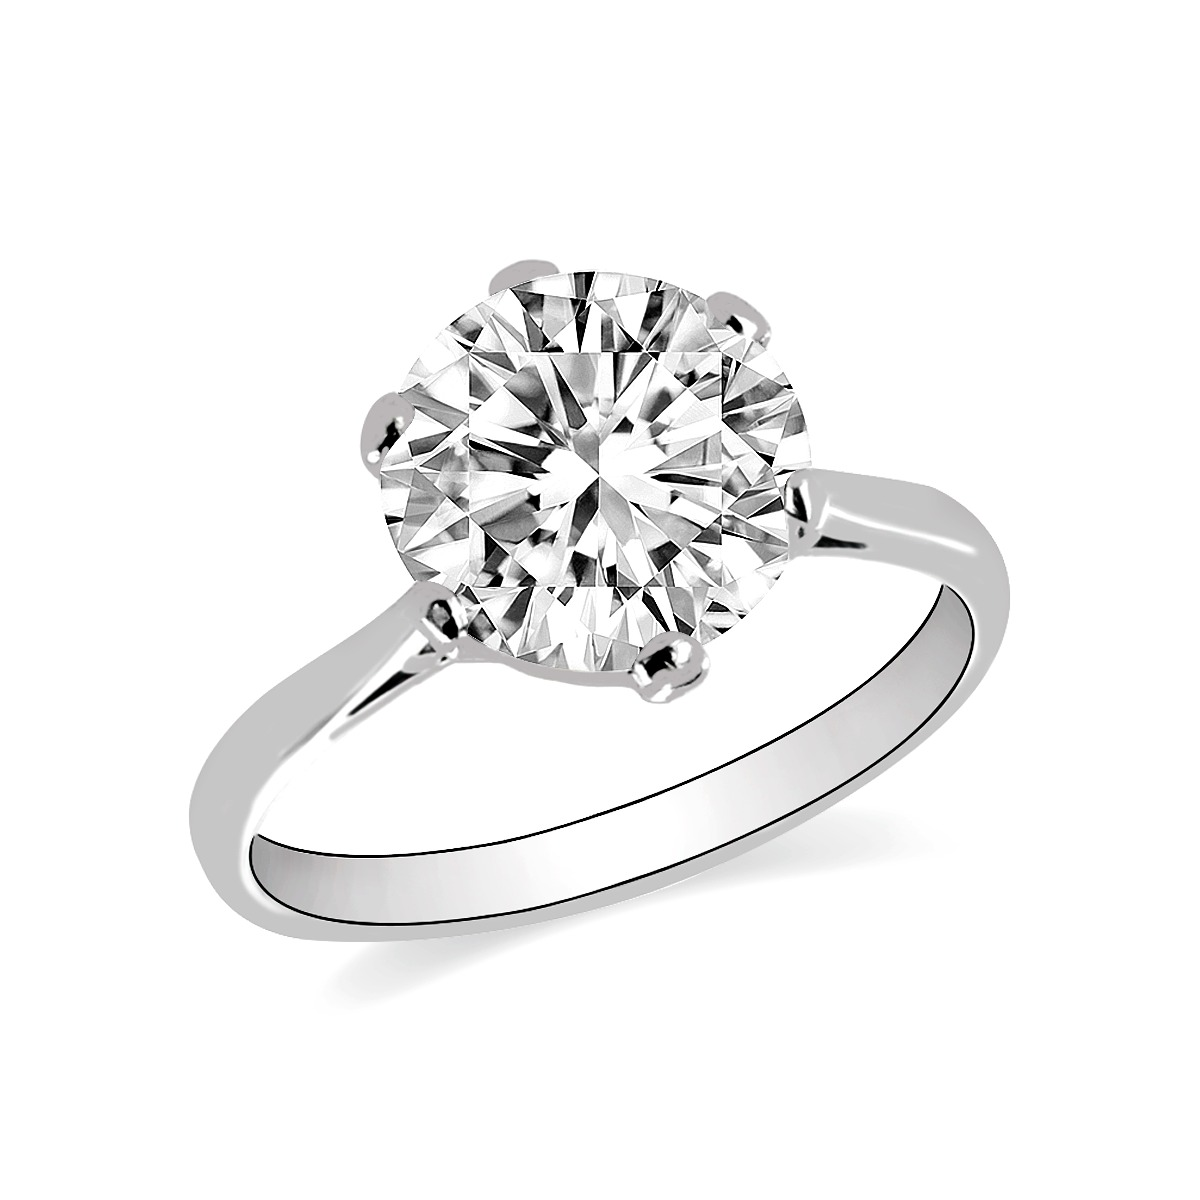 2.87ct Siena Diamond Solitaire Engagement Ring | G Colour | Platinum